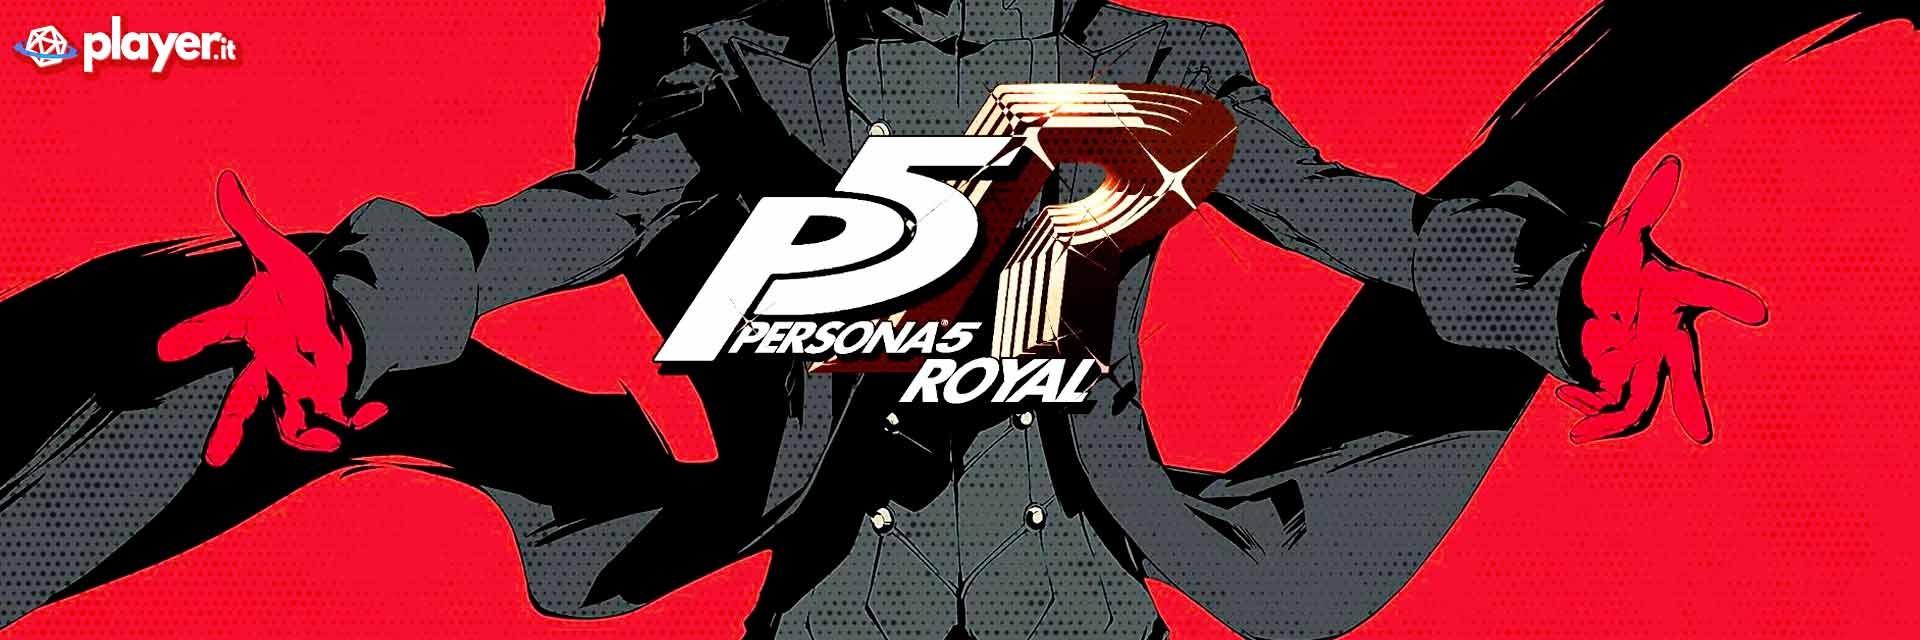 persona 5 royal wallpaper in hd